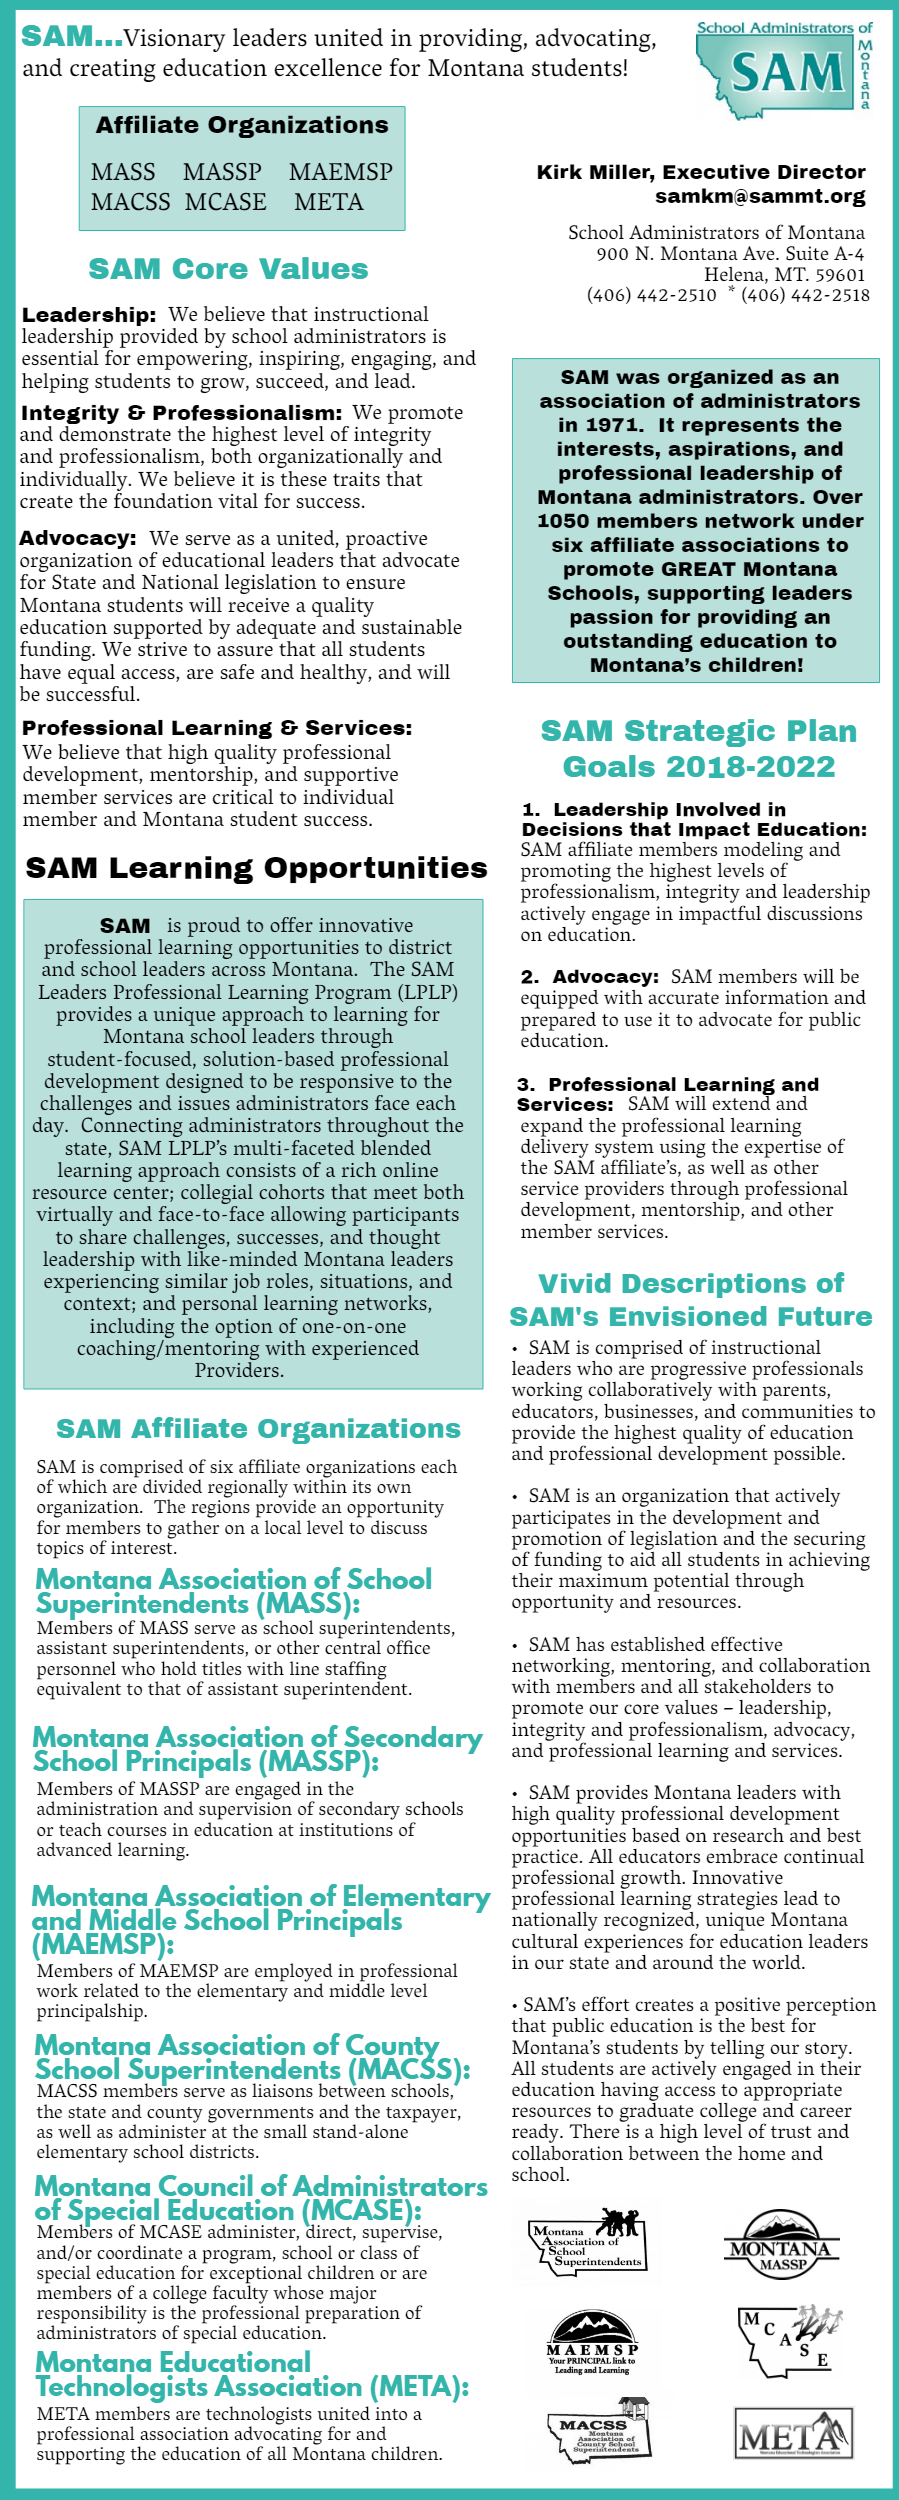 SAM Trifold Brochure Infographic.jpg - 1.60 Mb